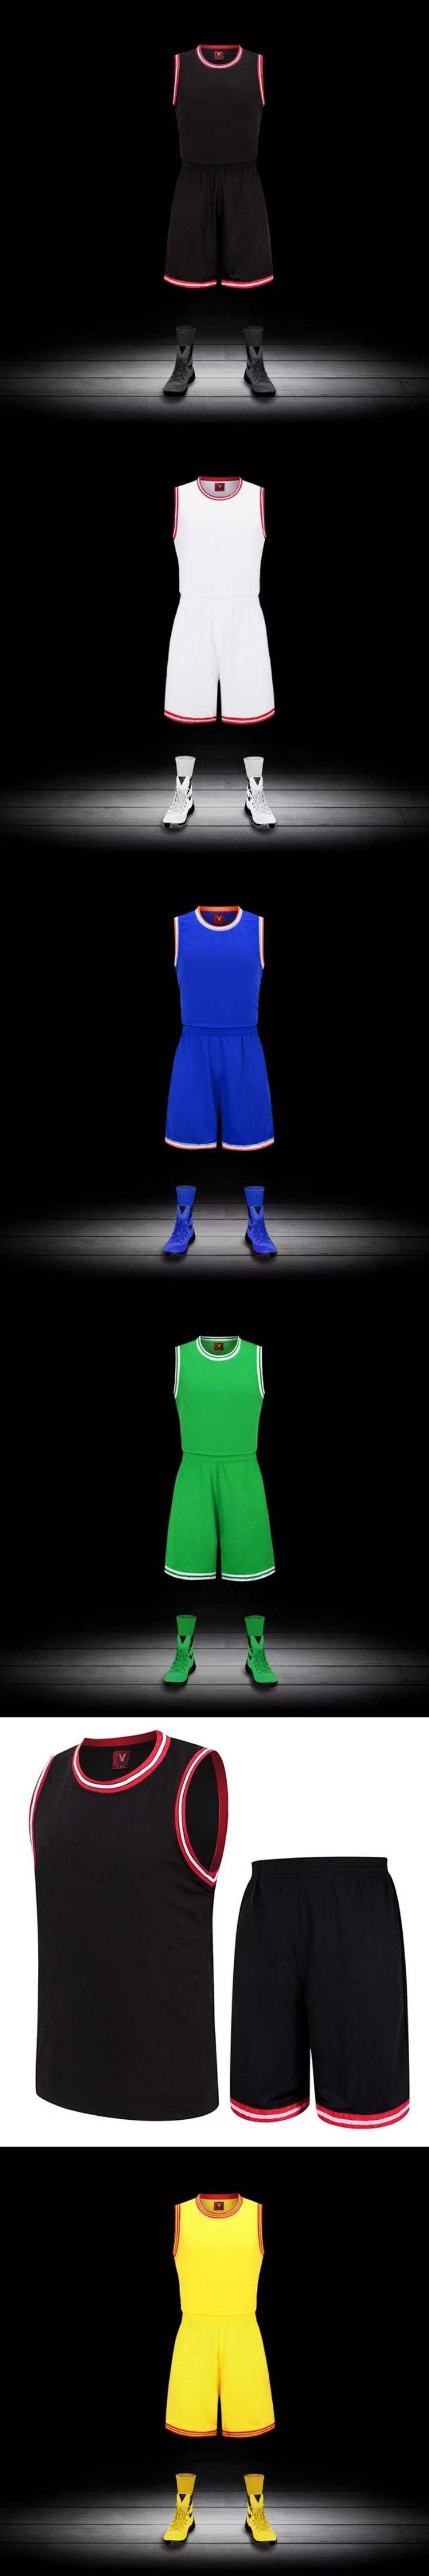 2017 New Men Basketball Jersey Sets Uniforms Adult Sports clothing Breathable basketball jerseys shirts shorts DIY Customized